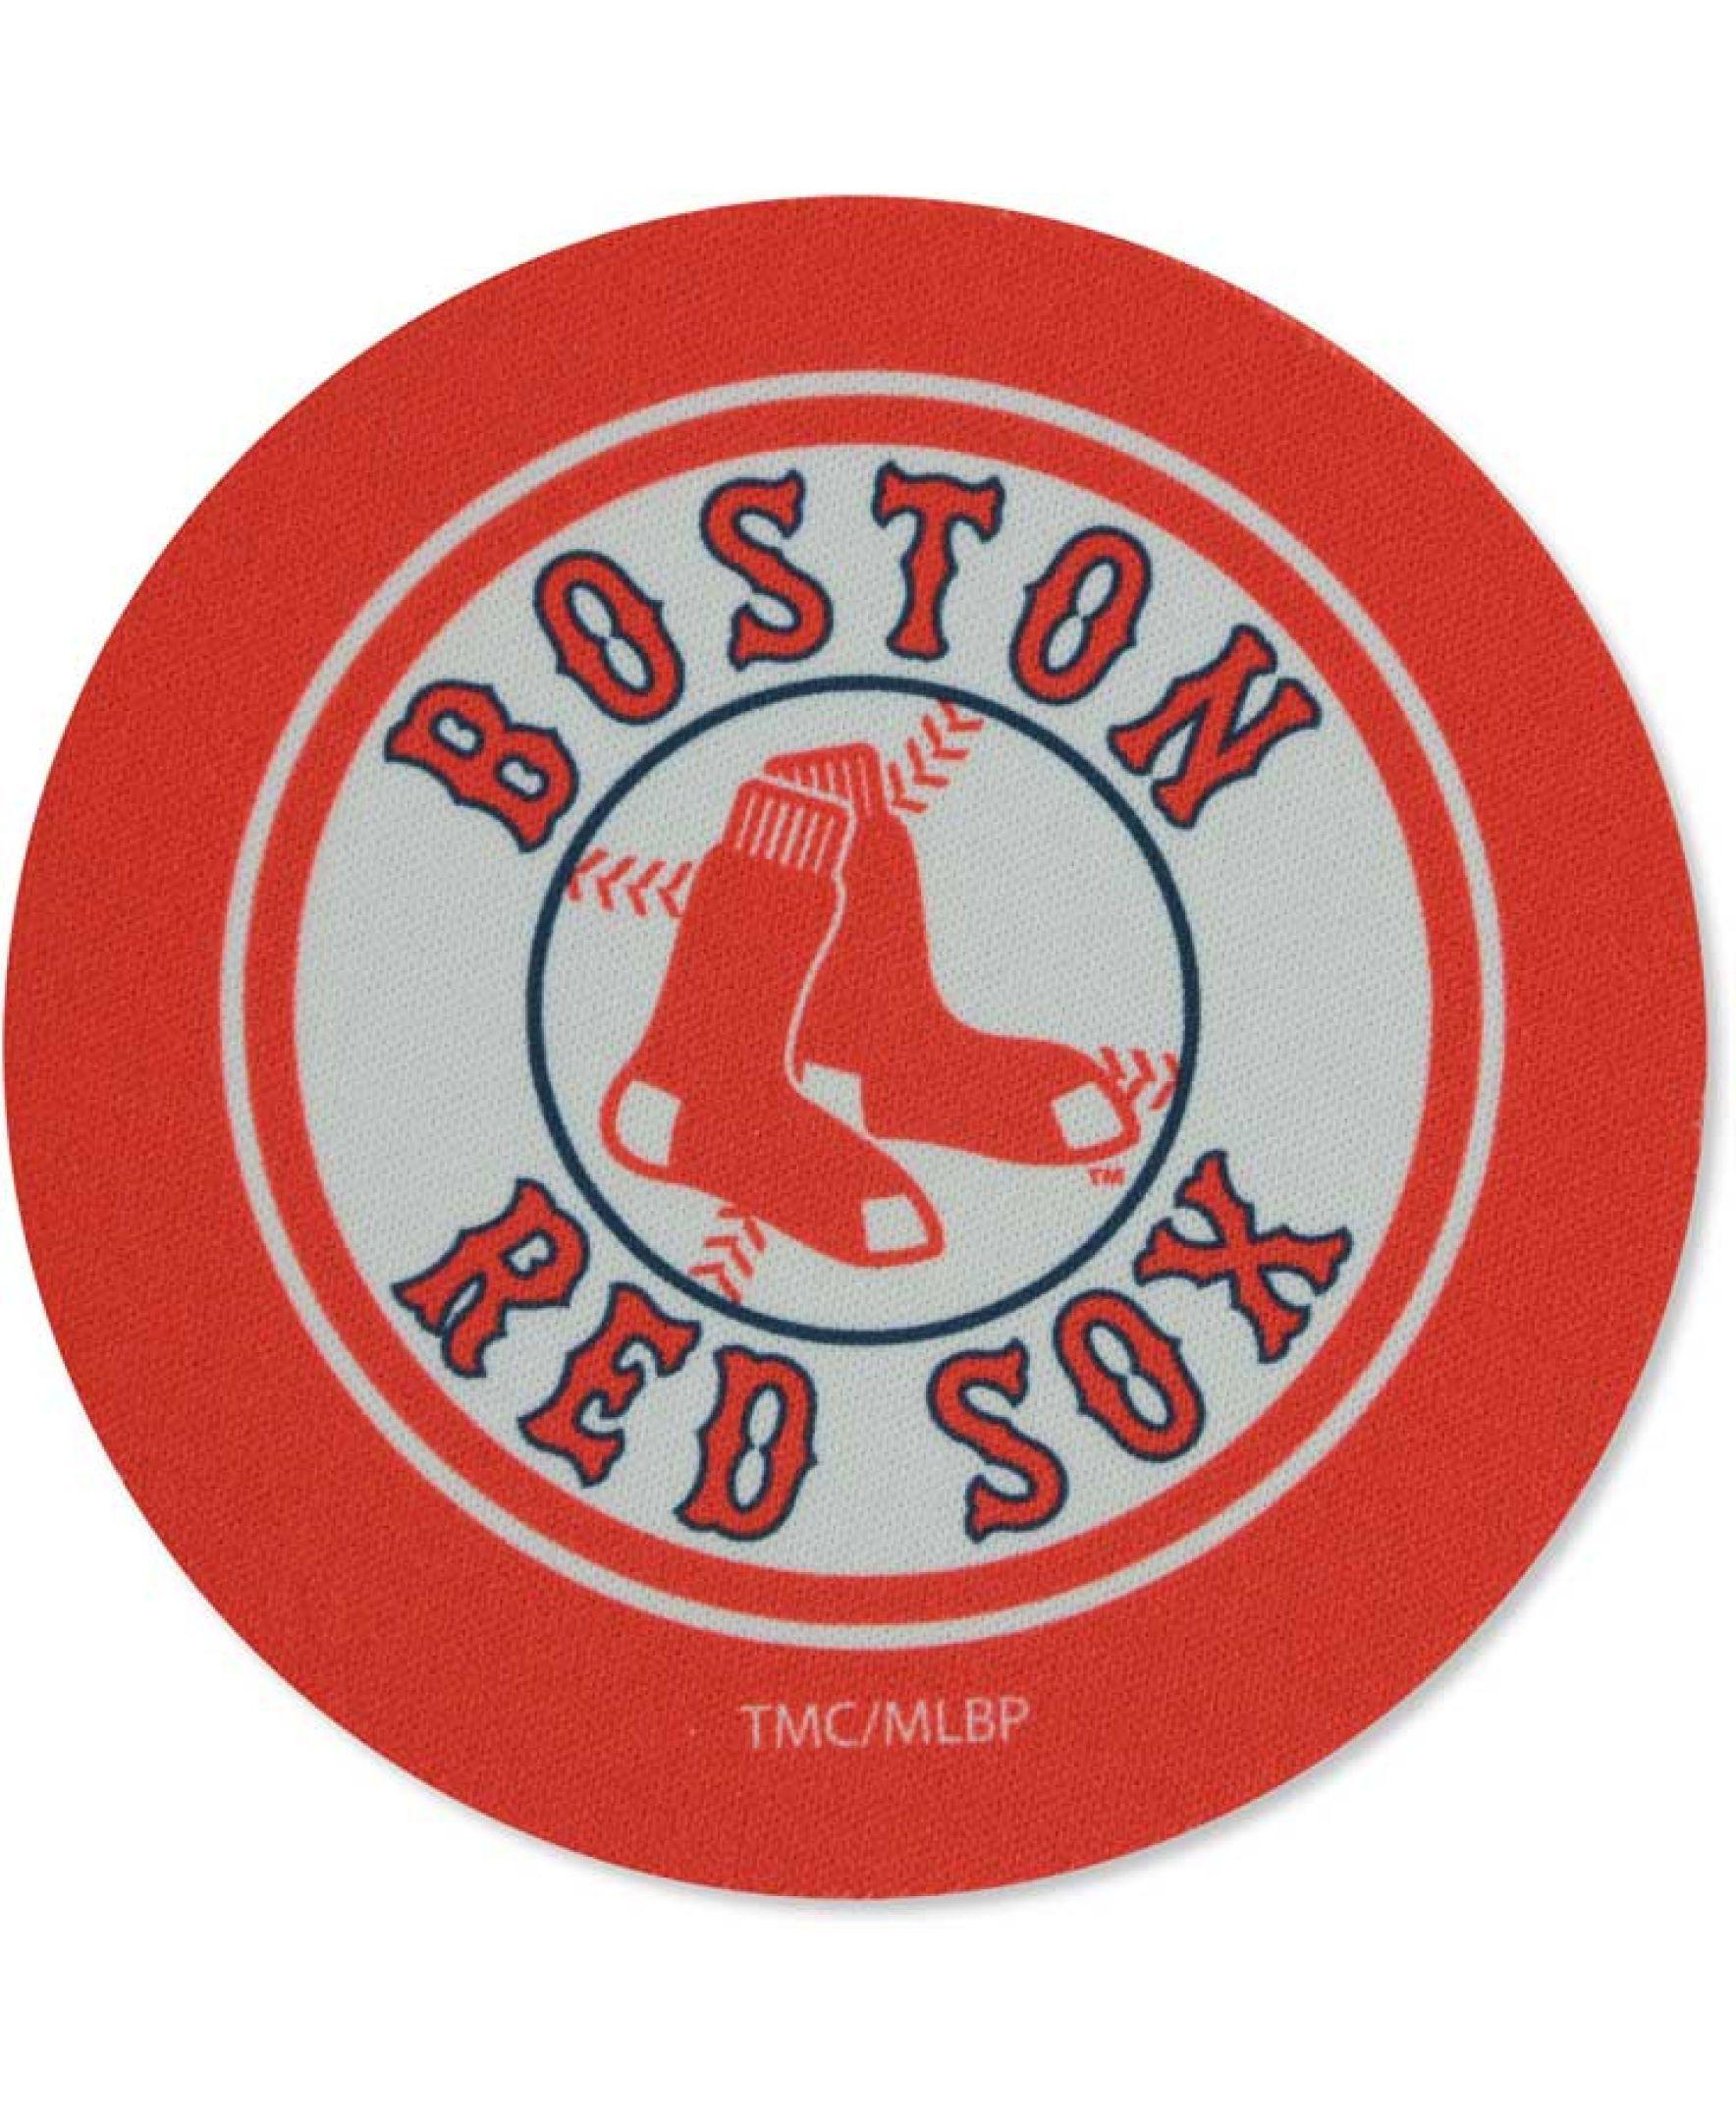 Memory Company Boston Red Sox 4-Pack Coaster Set